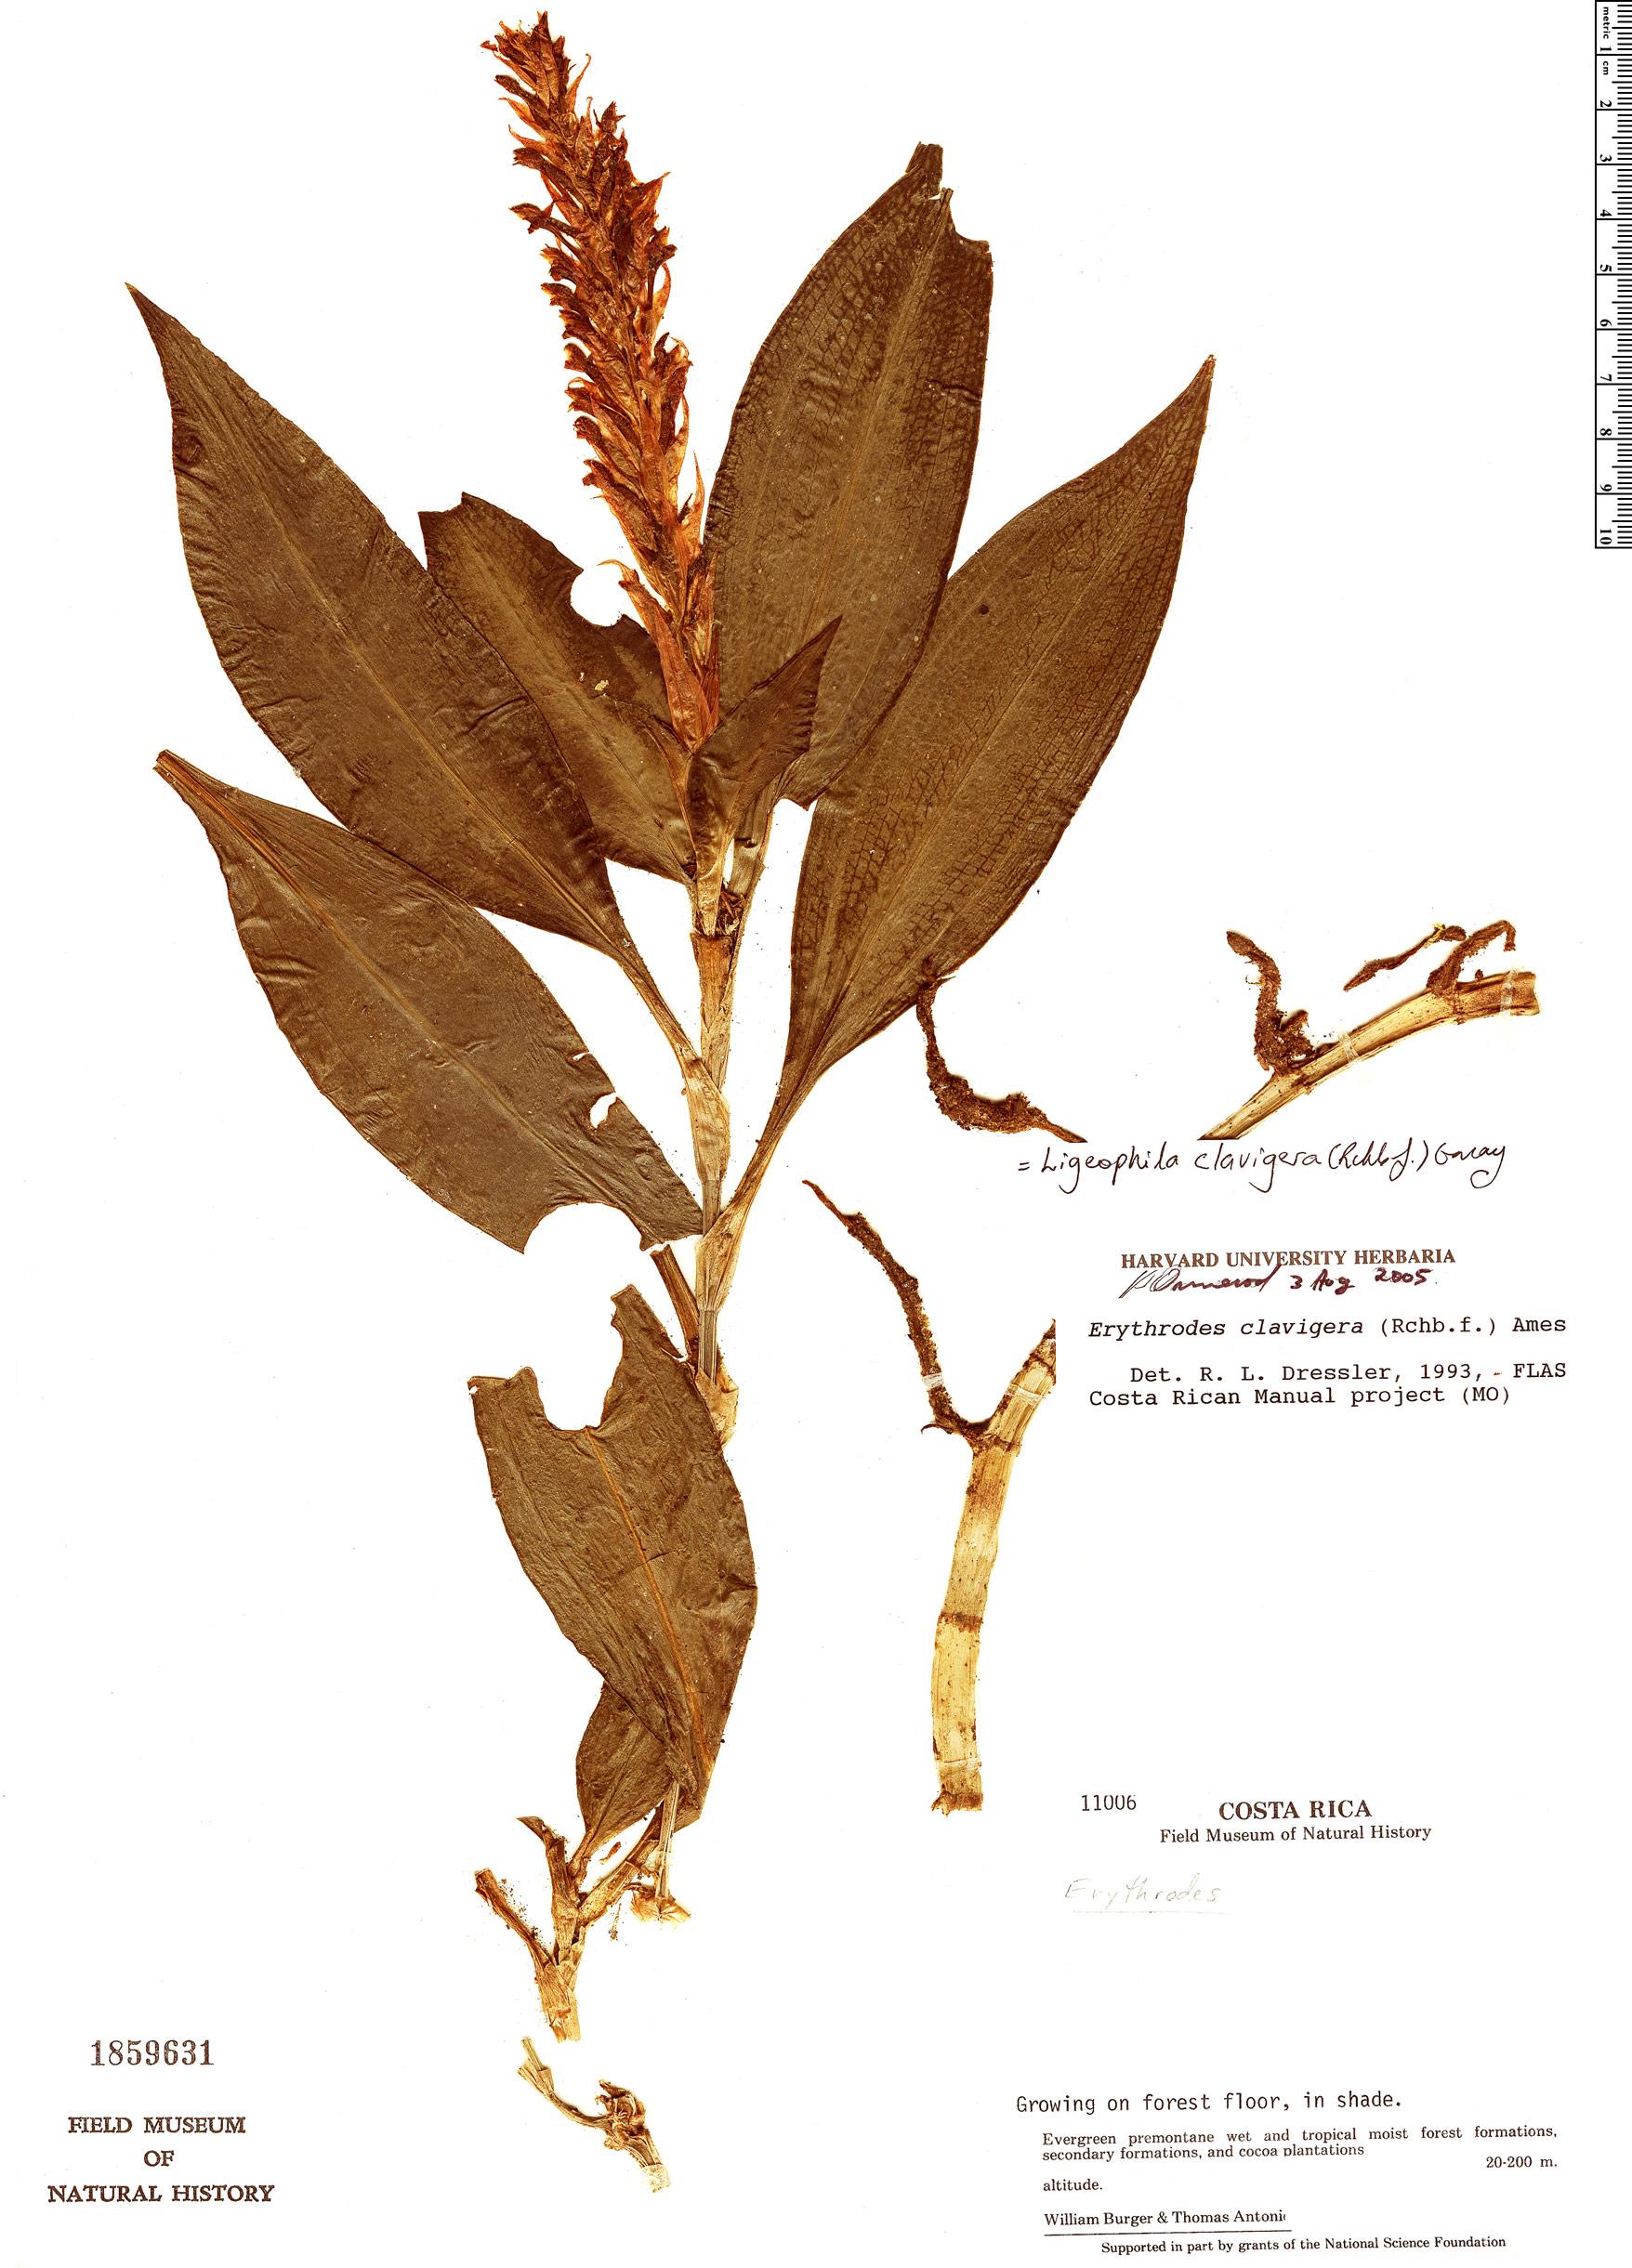 Specimen: Ligeophila clavigera